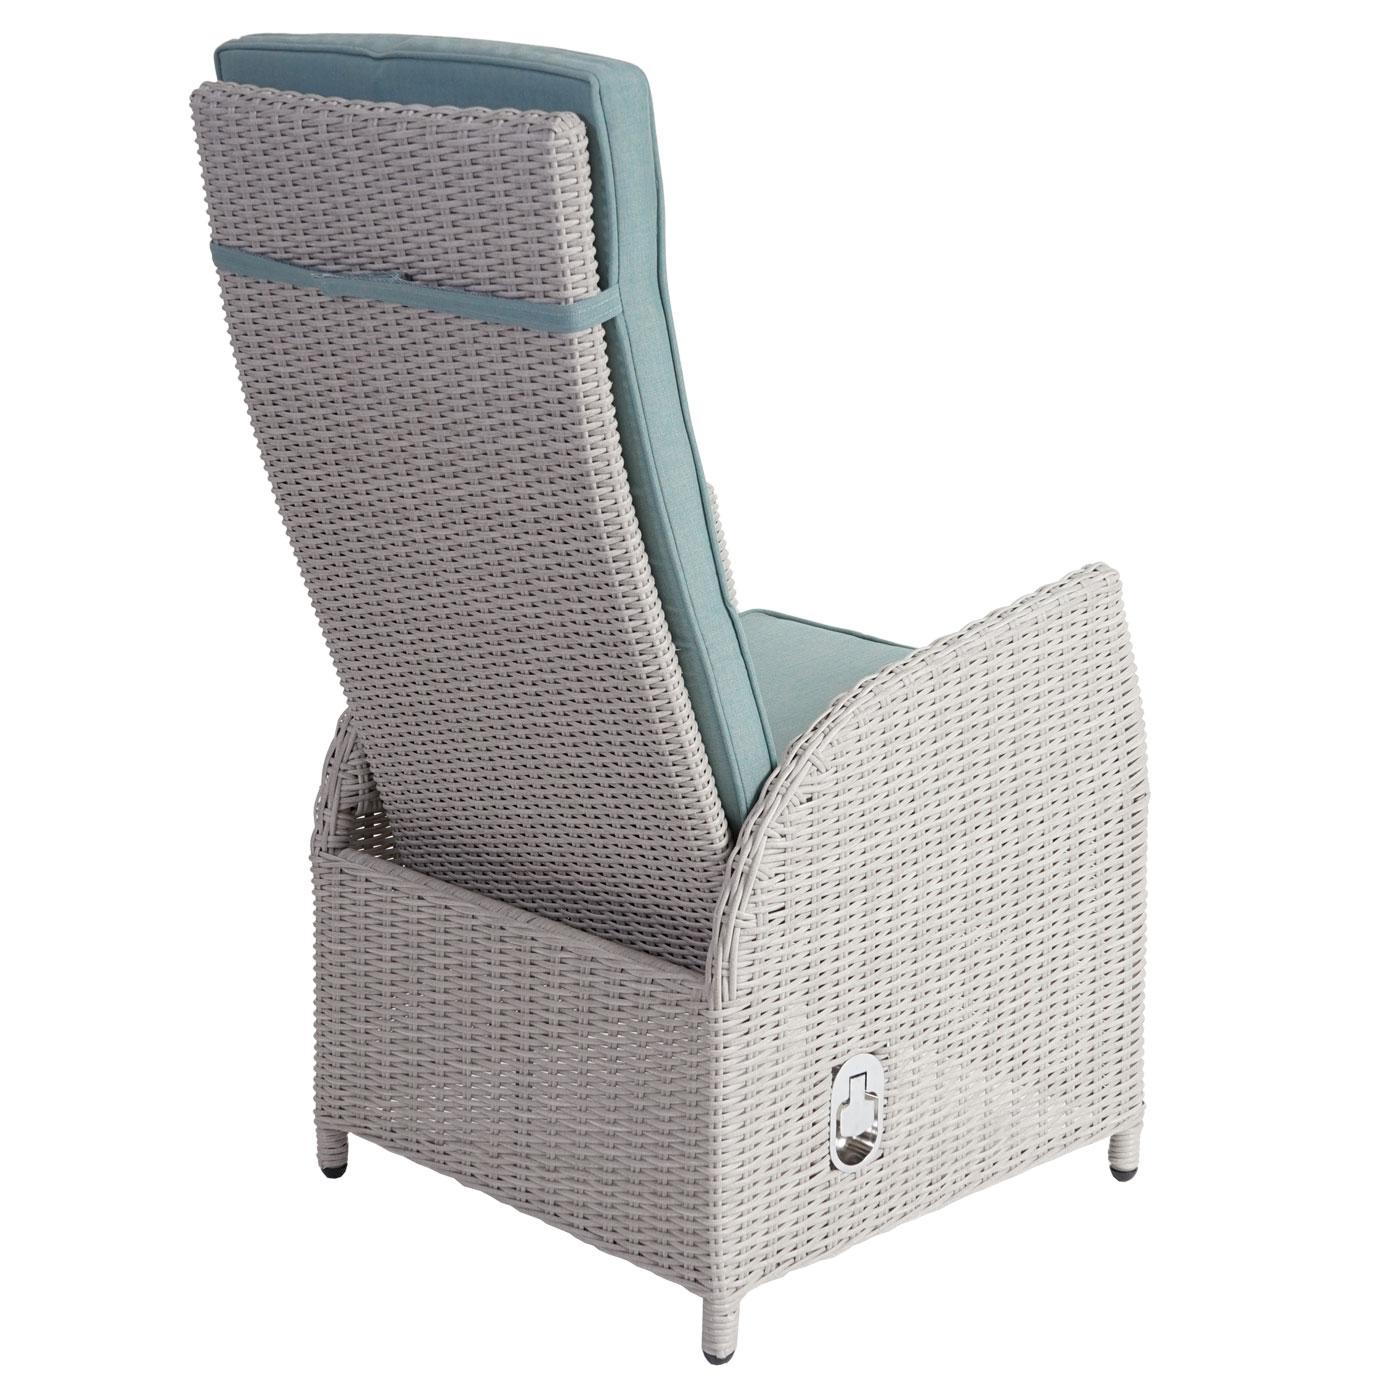 Luxus Poly Rattan Garnitur Badalona Premium Alu Sitzgruppe Tisch